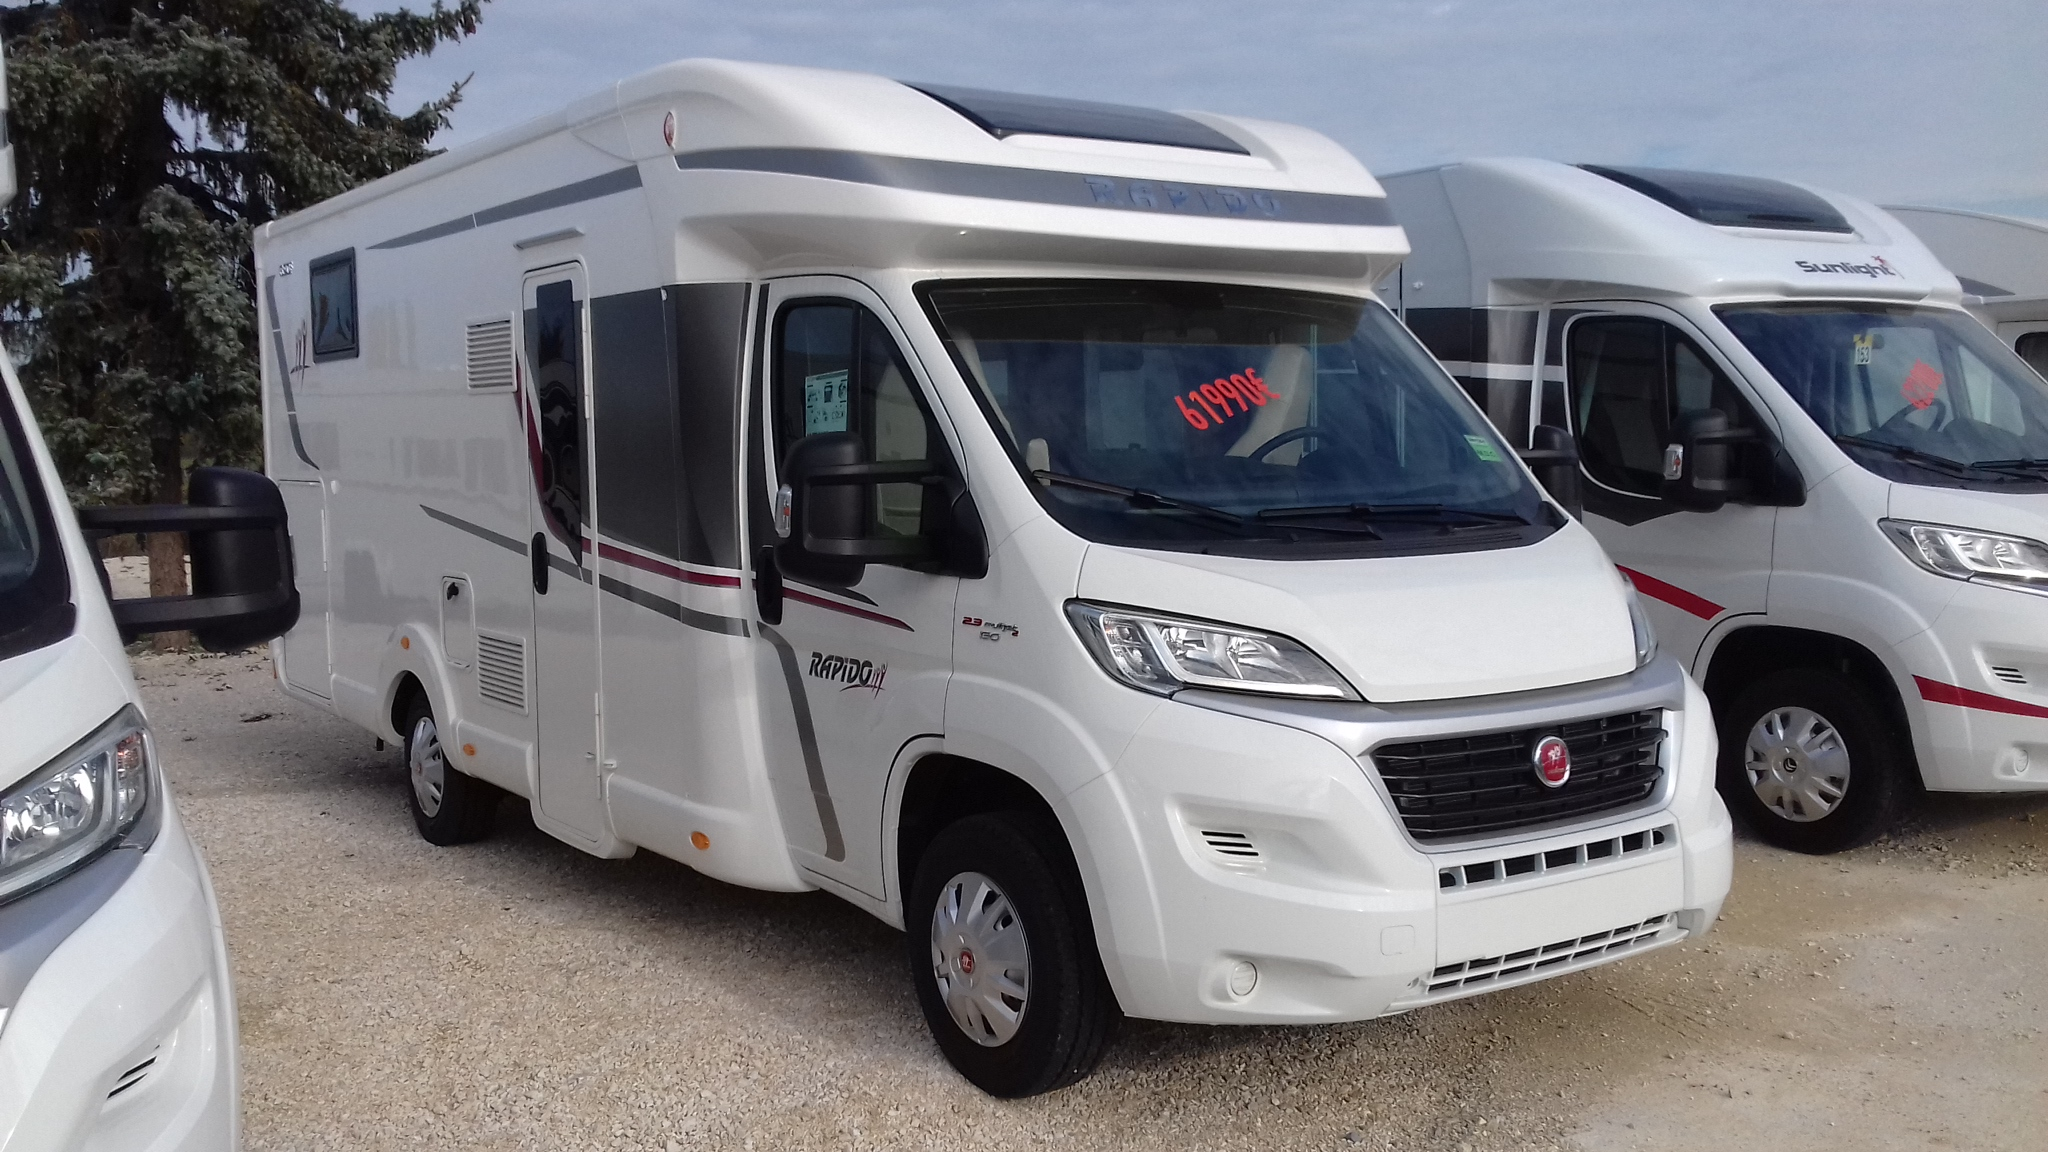 rapido 690 f neuf de 2018 fiat camping car en vente appoigny yonne 89. Black Bedroom Furniture Sets. Home Design Ideas